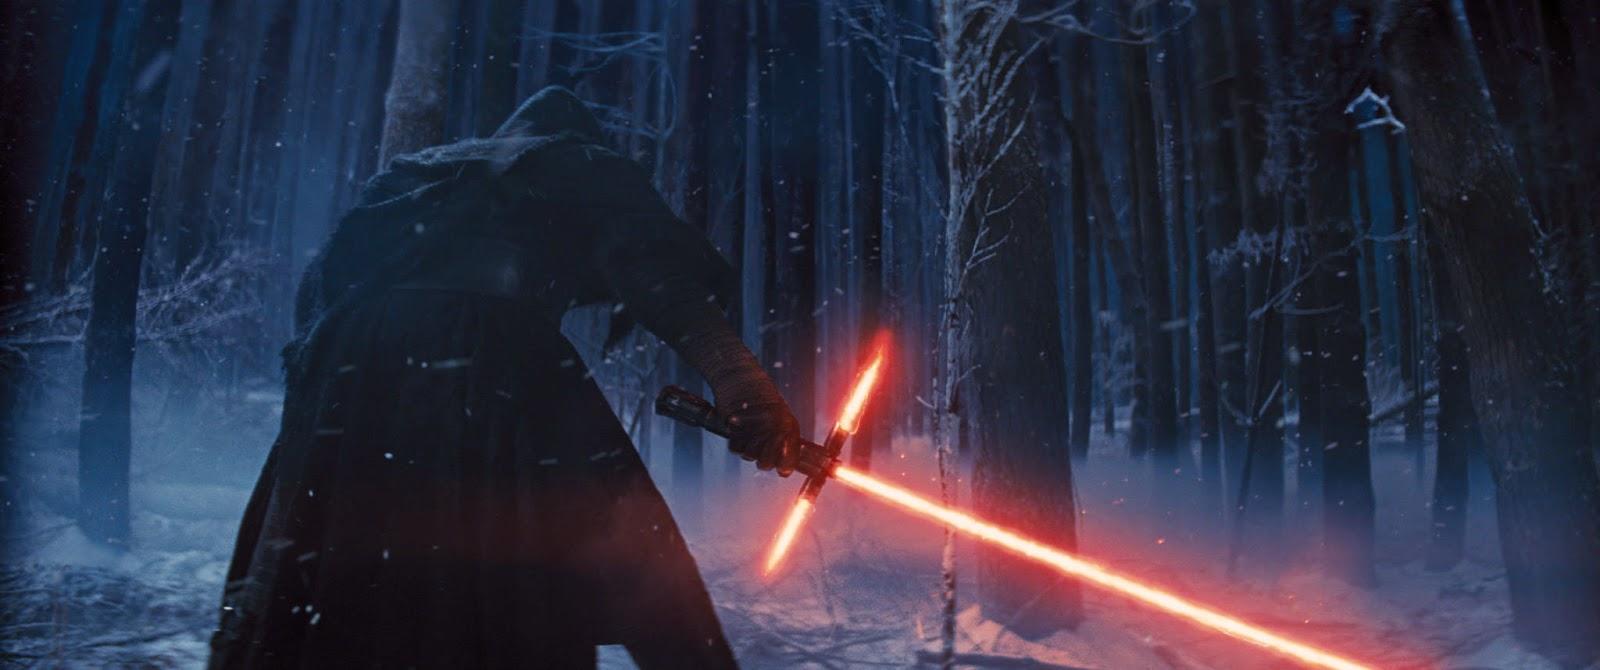 sith broadsword saber